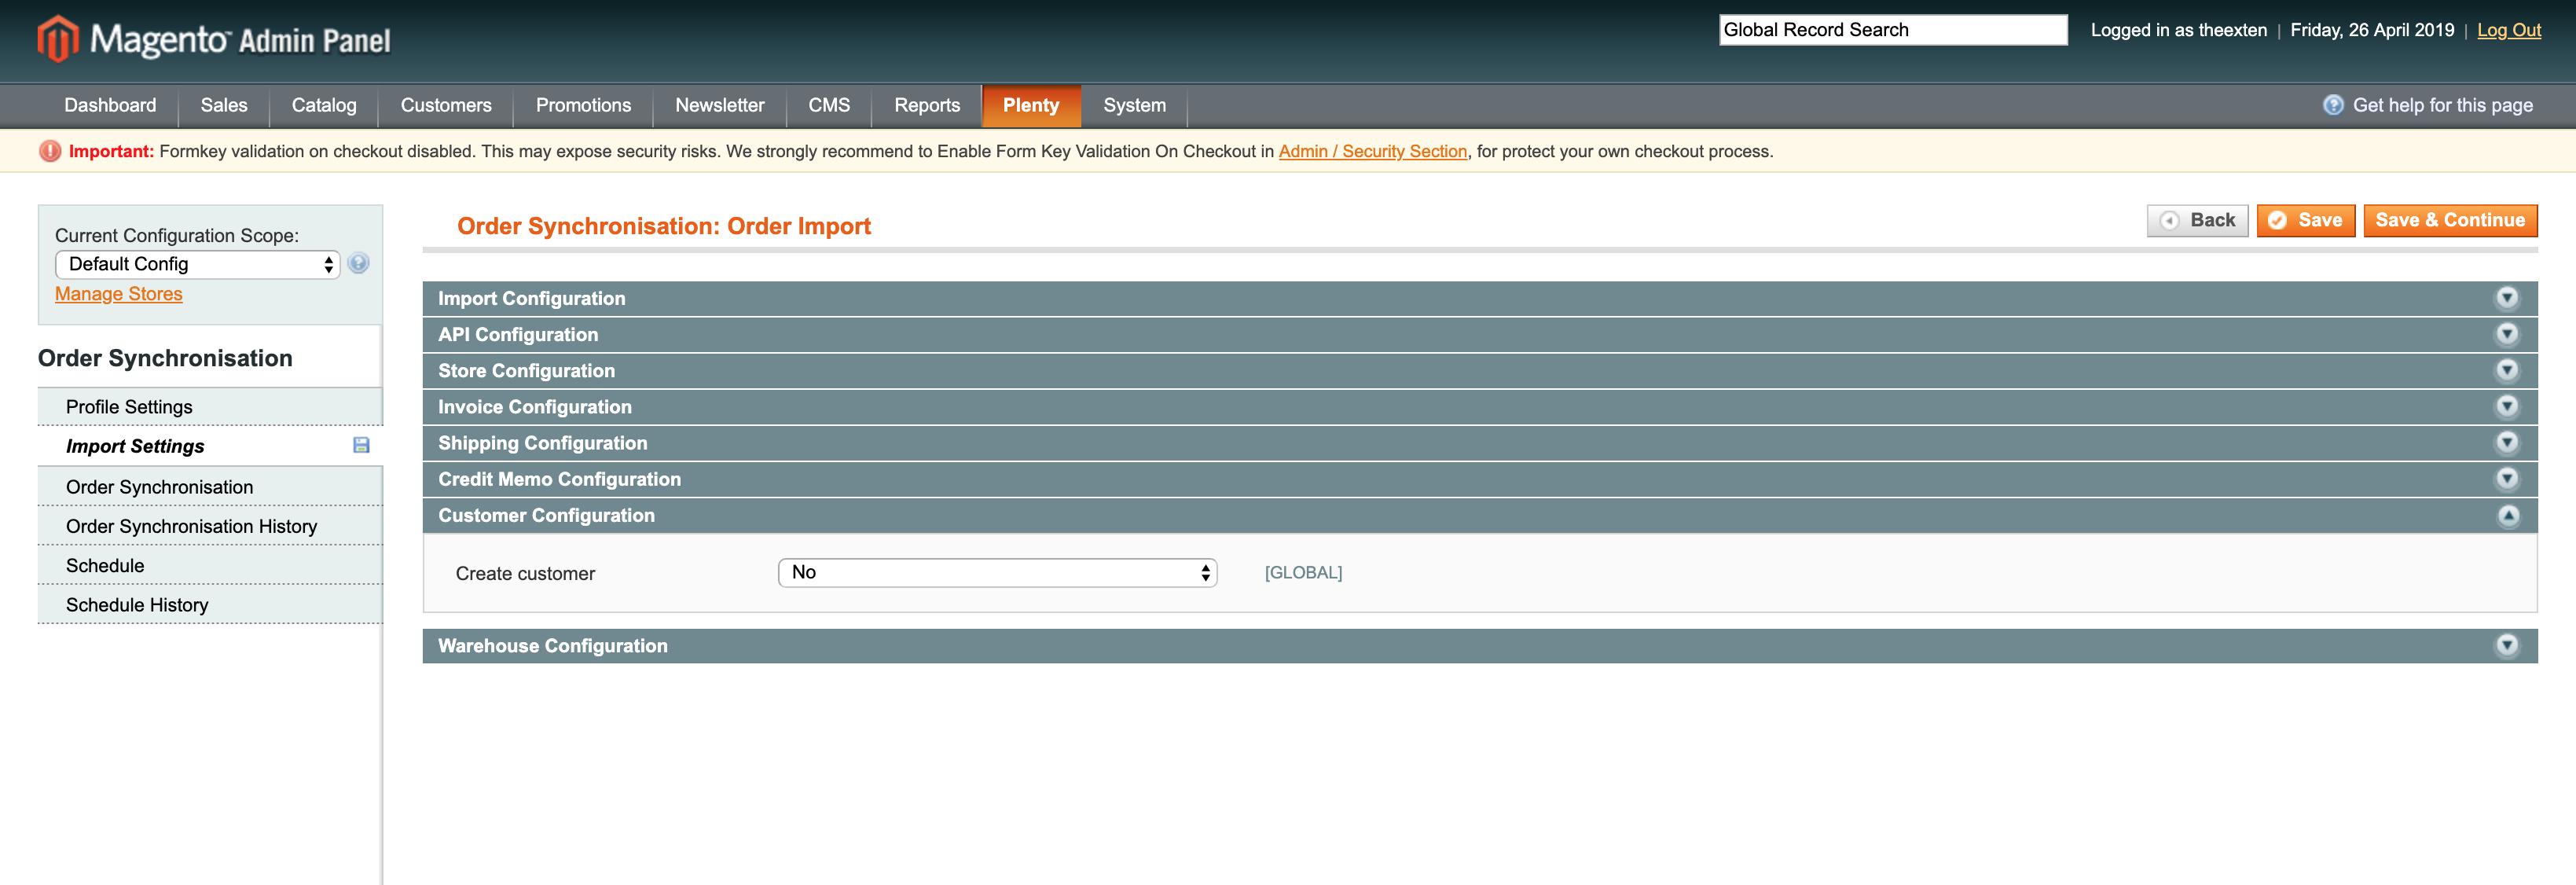 Mage2Plenty - order import configuration